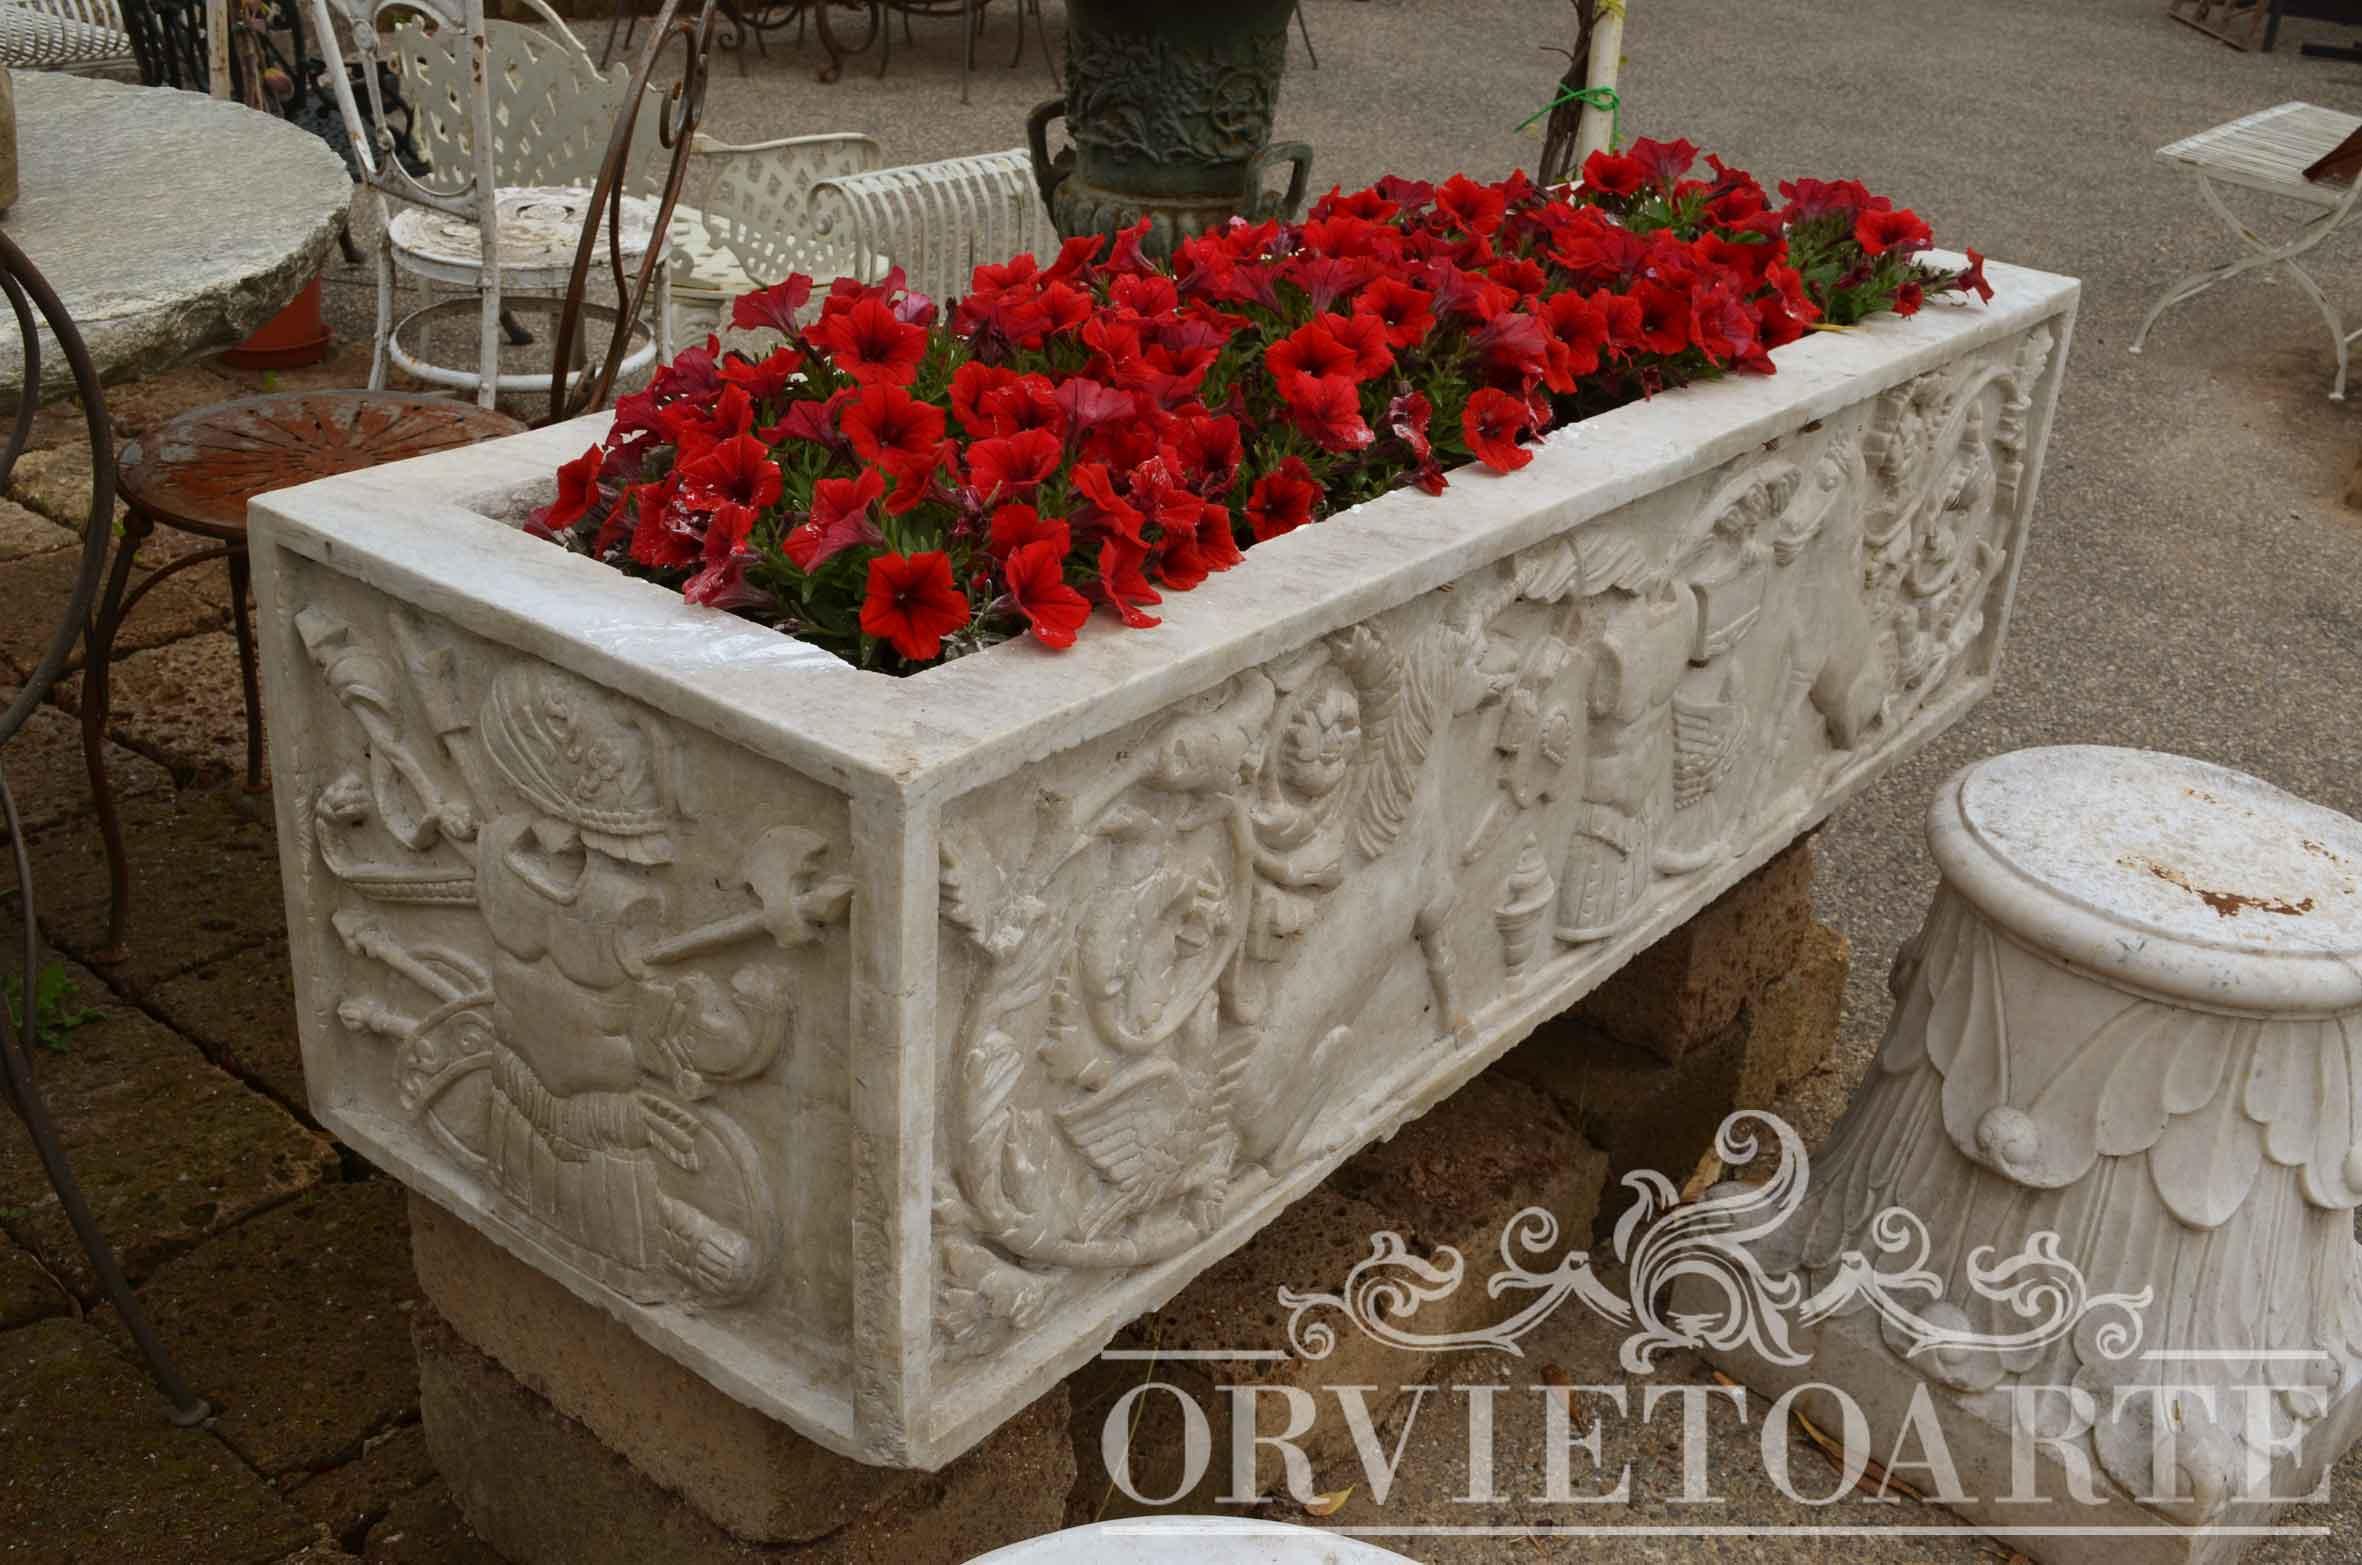 Orvieto arte vasca in marmo bianco con bassorilievo for Arredo giardino perugia